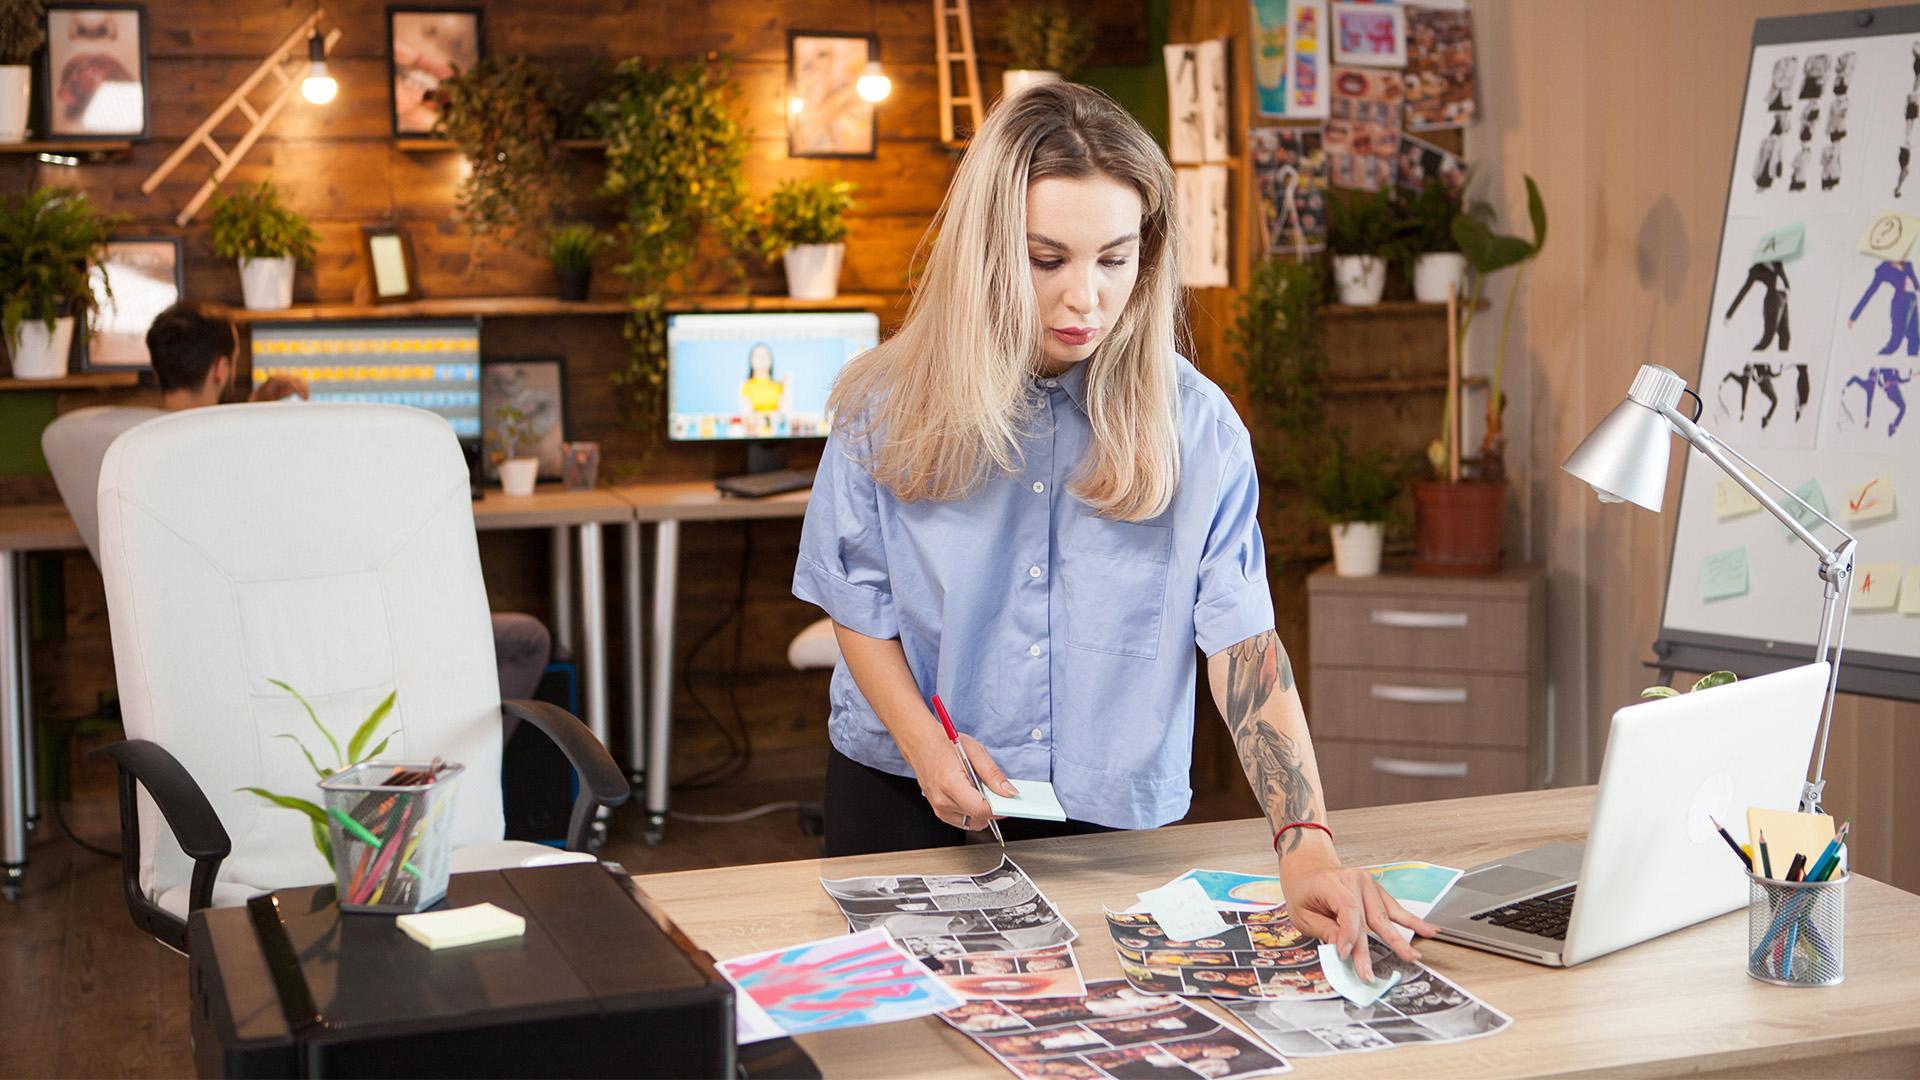 designer looking at designs